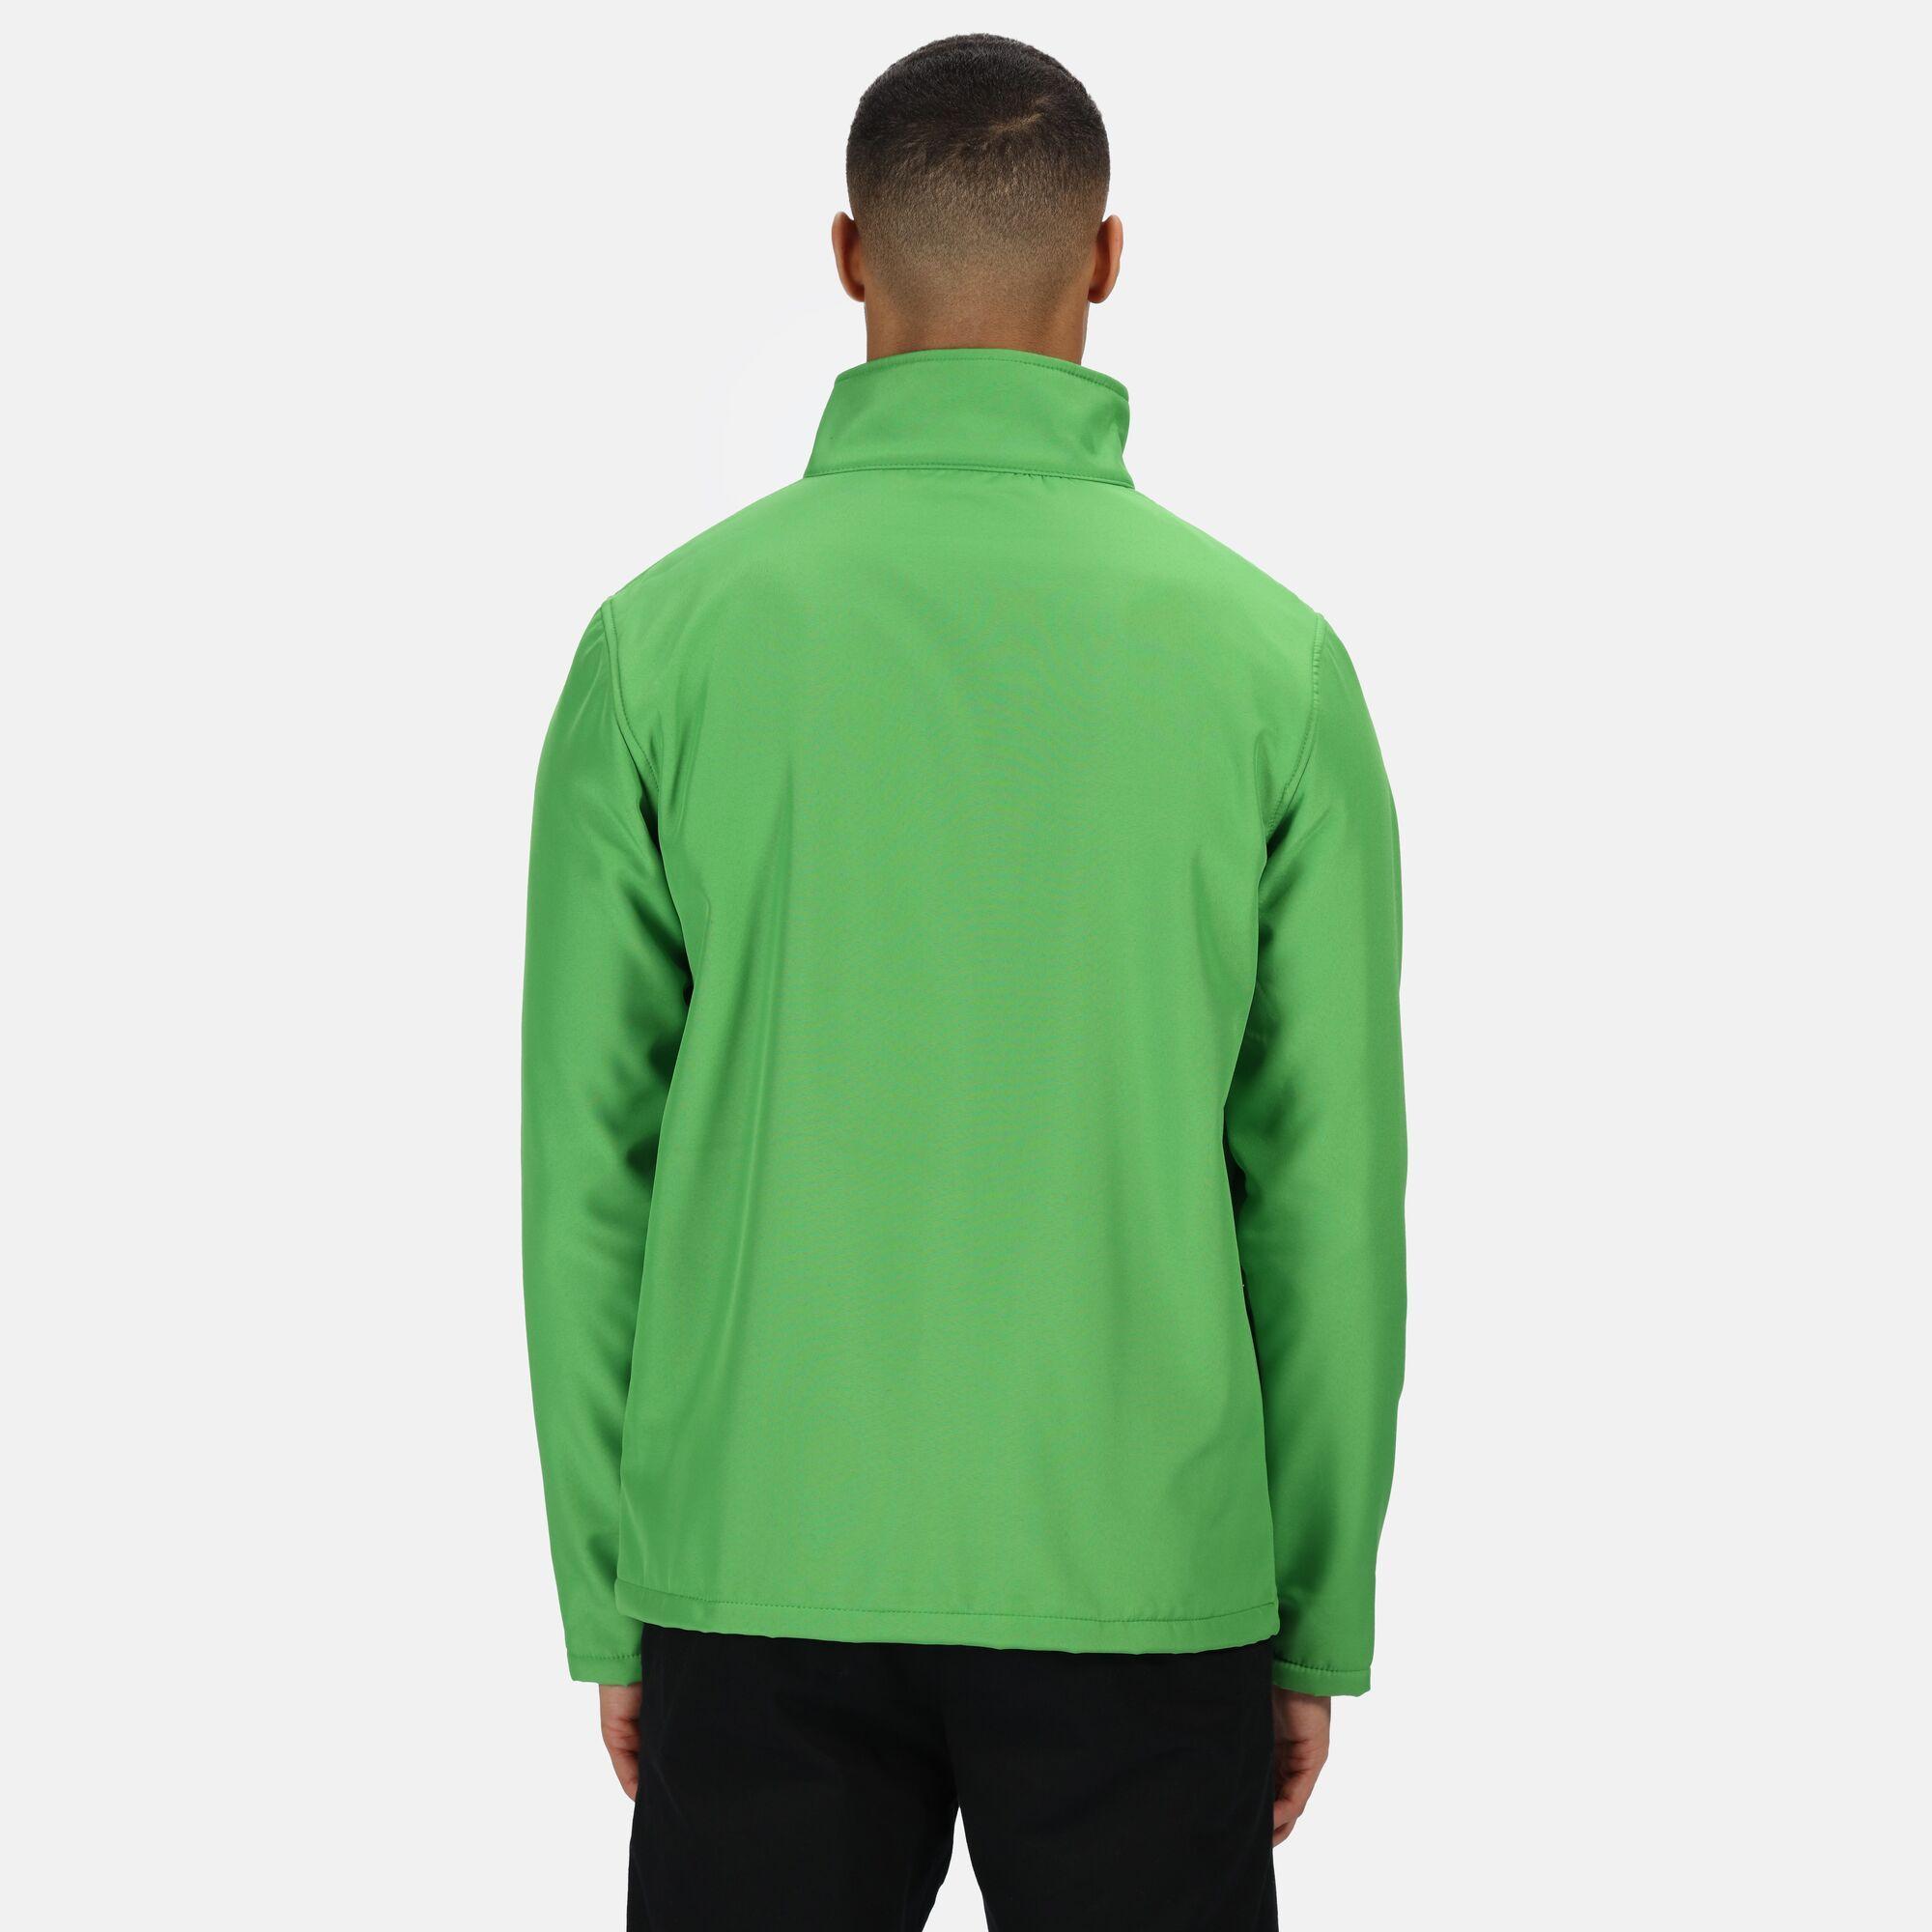 Regatta Standout Mens Ablaze Printable Soft Shell Jacket (M) (Classic Red/Black)